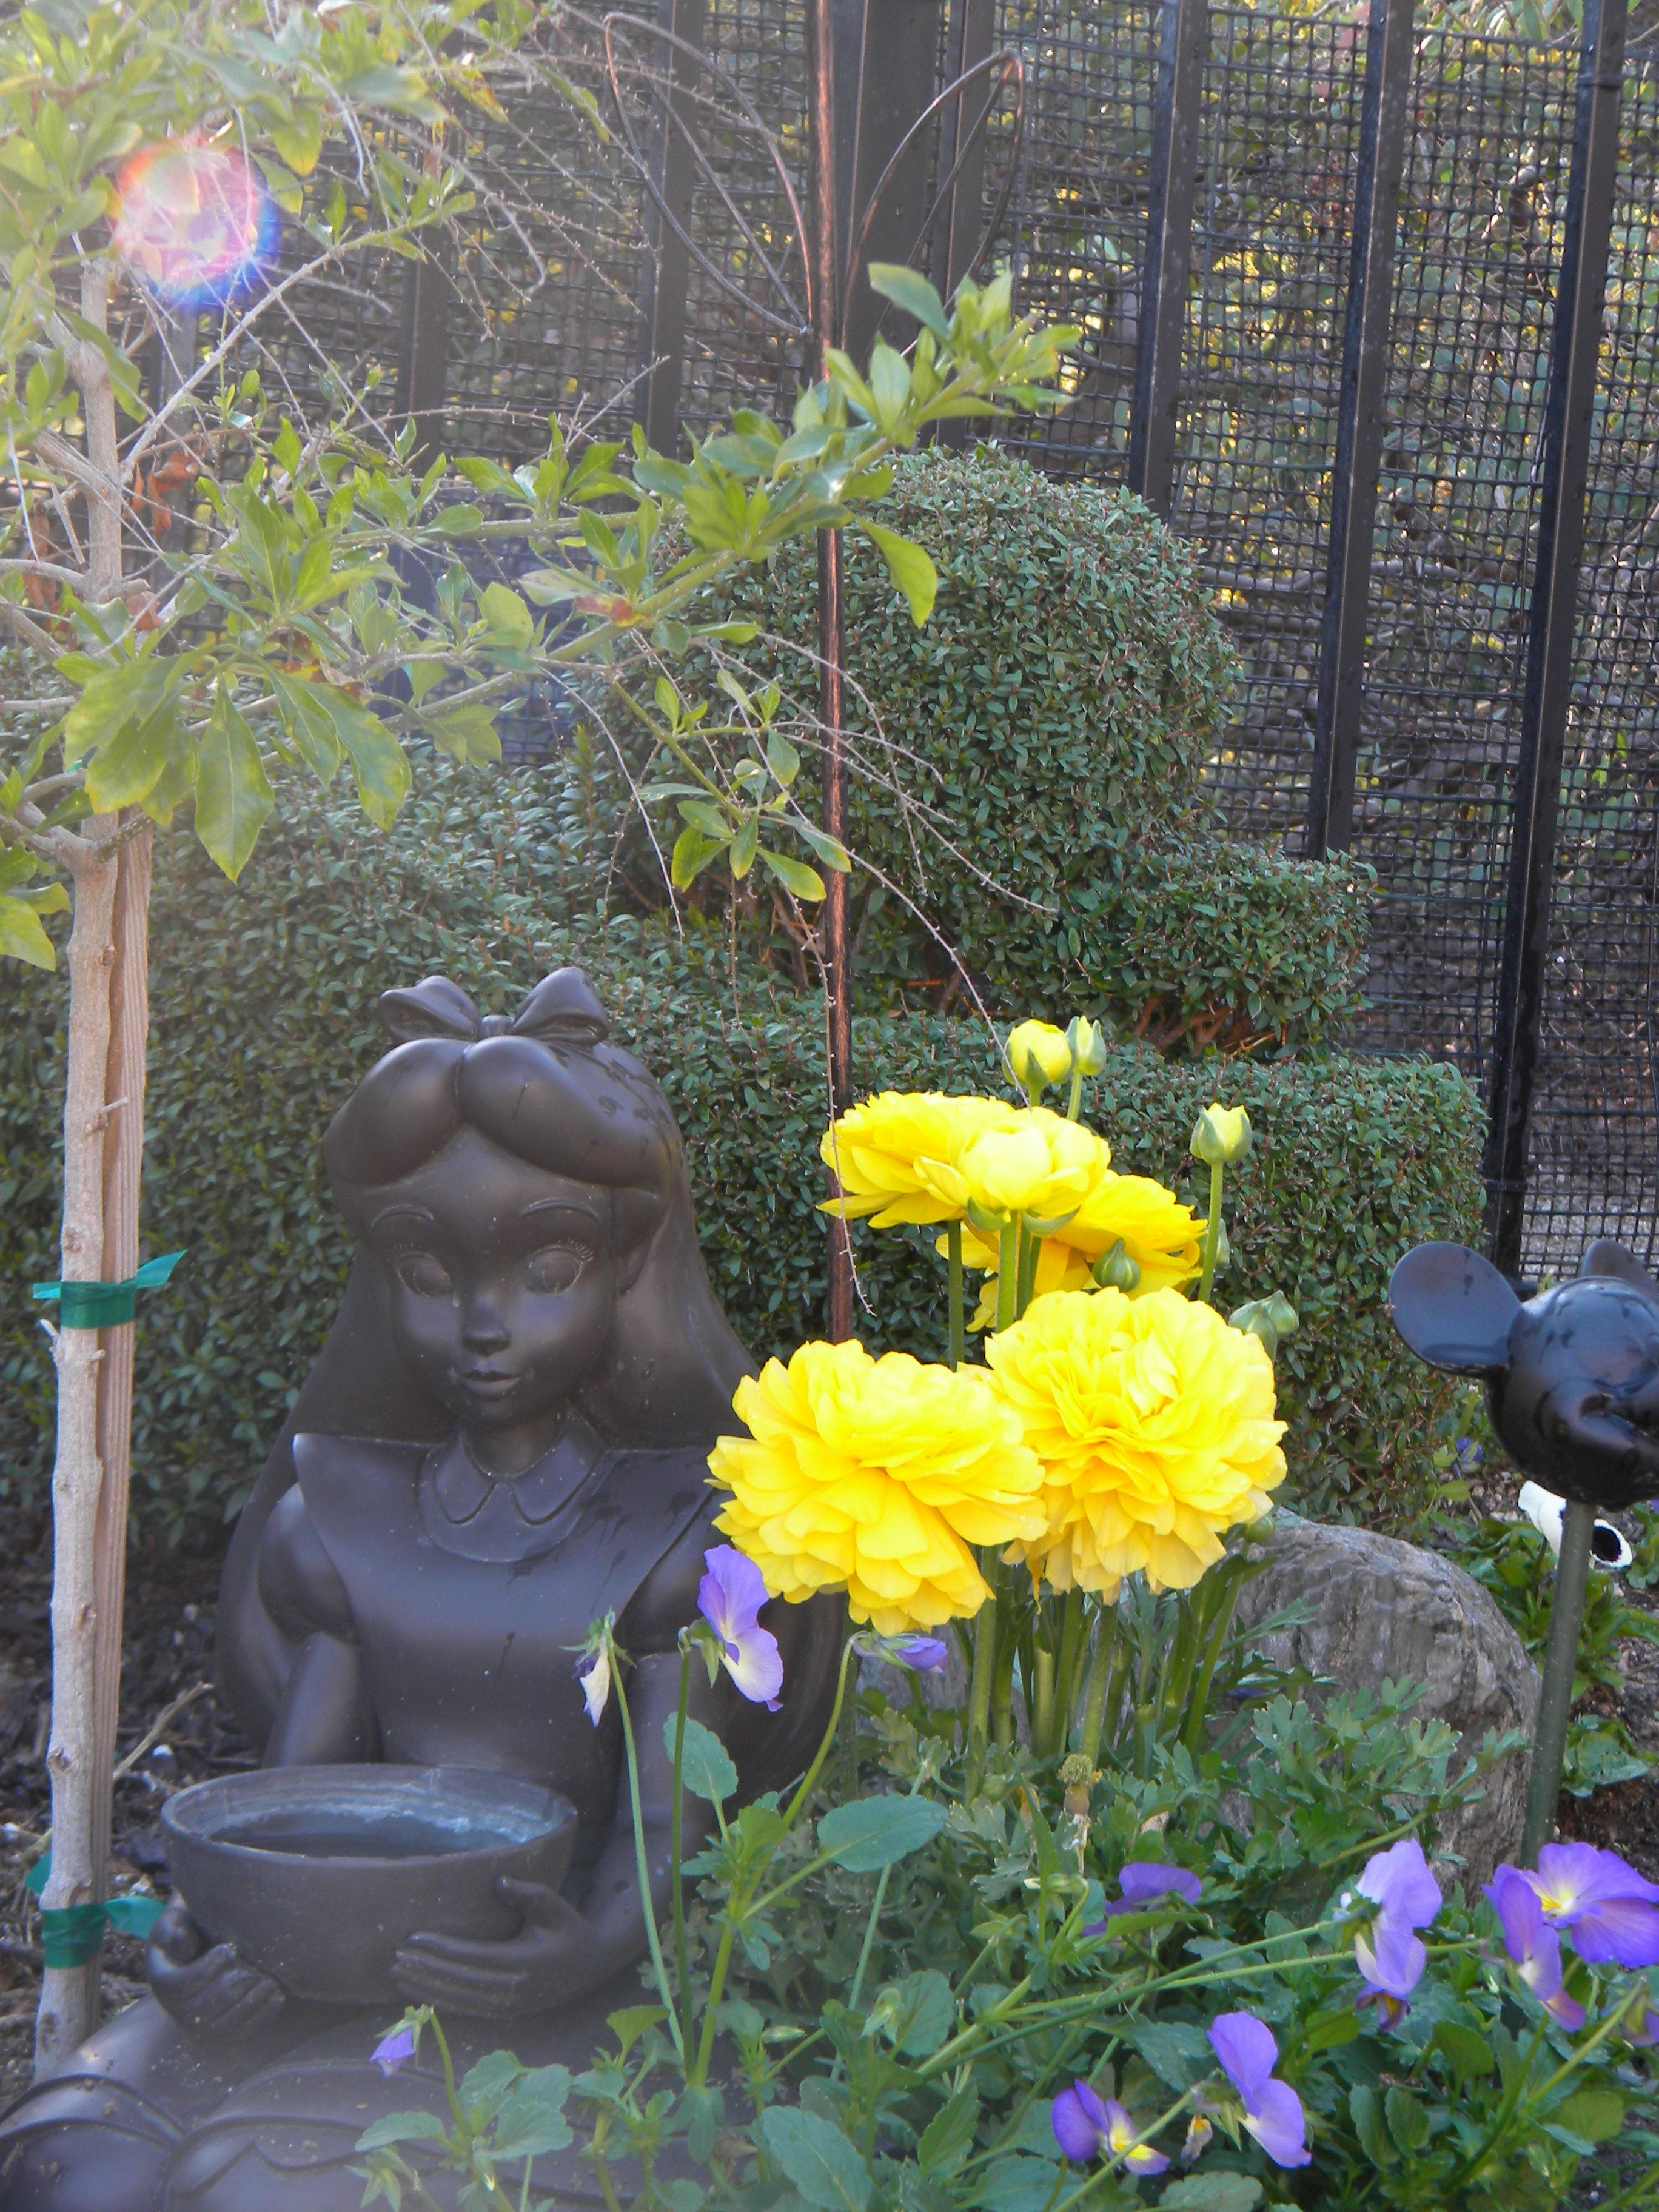 Disney Garden Statues